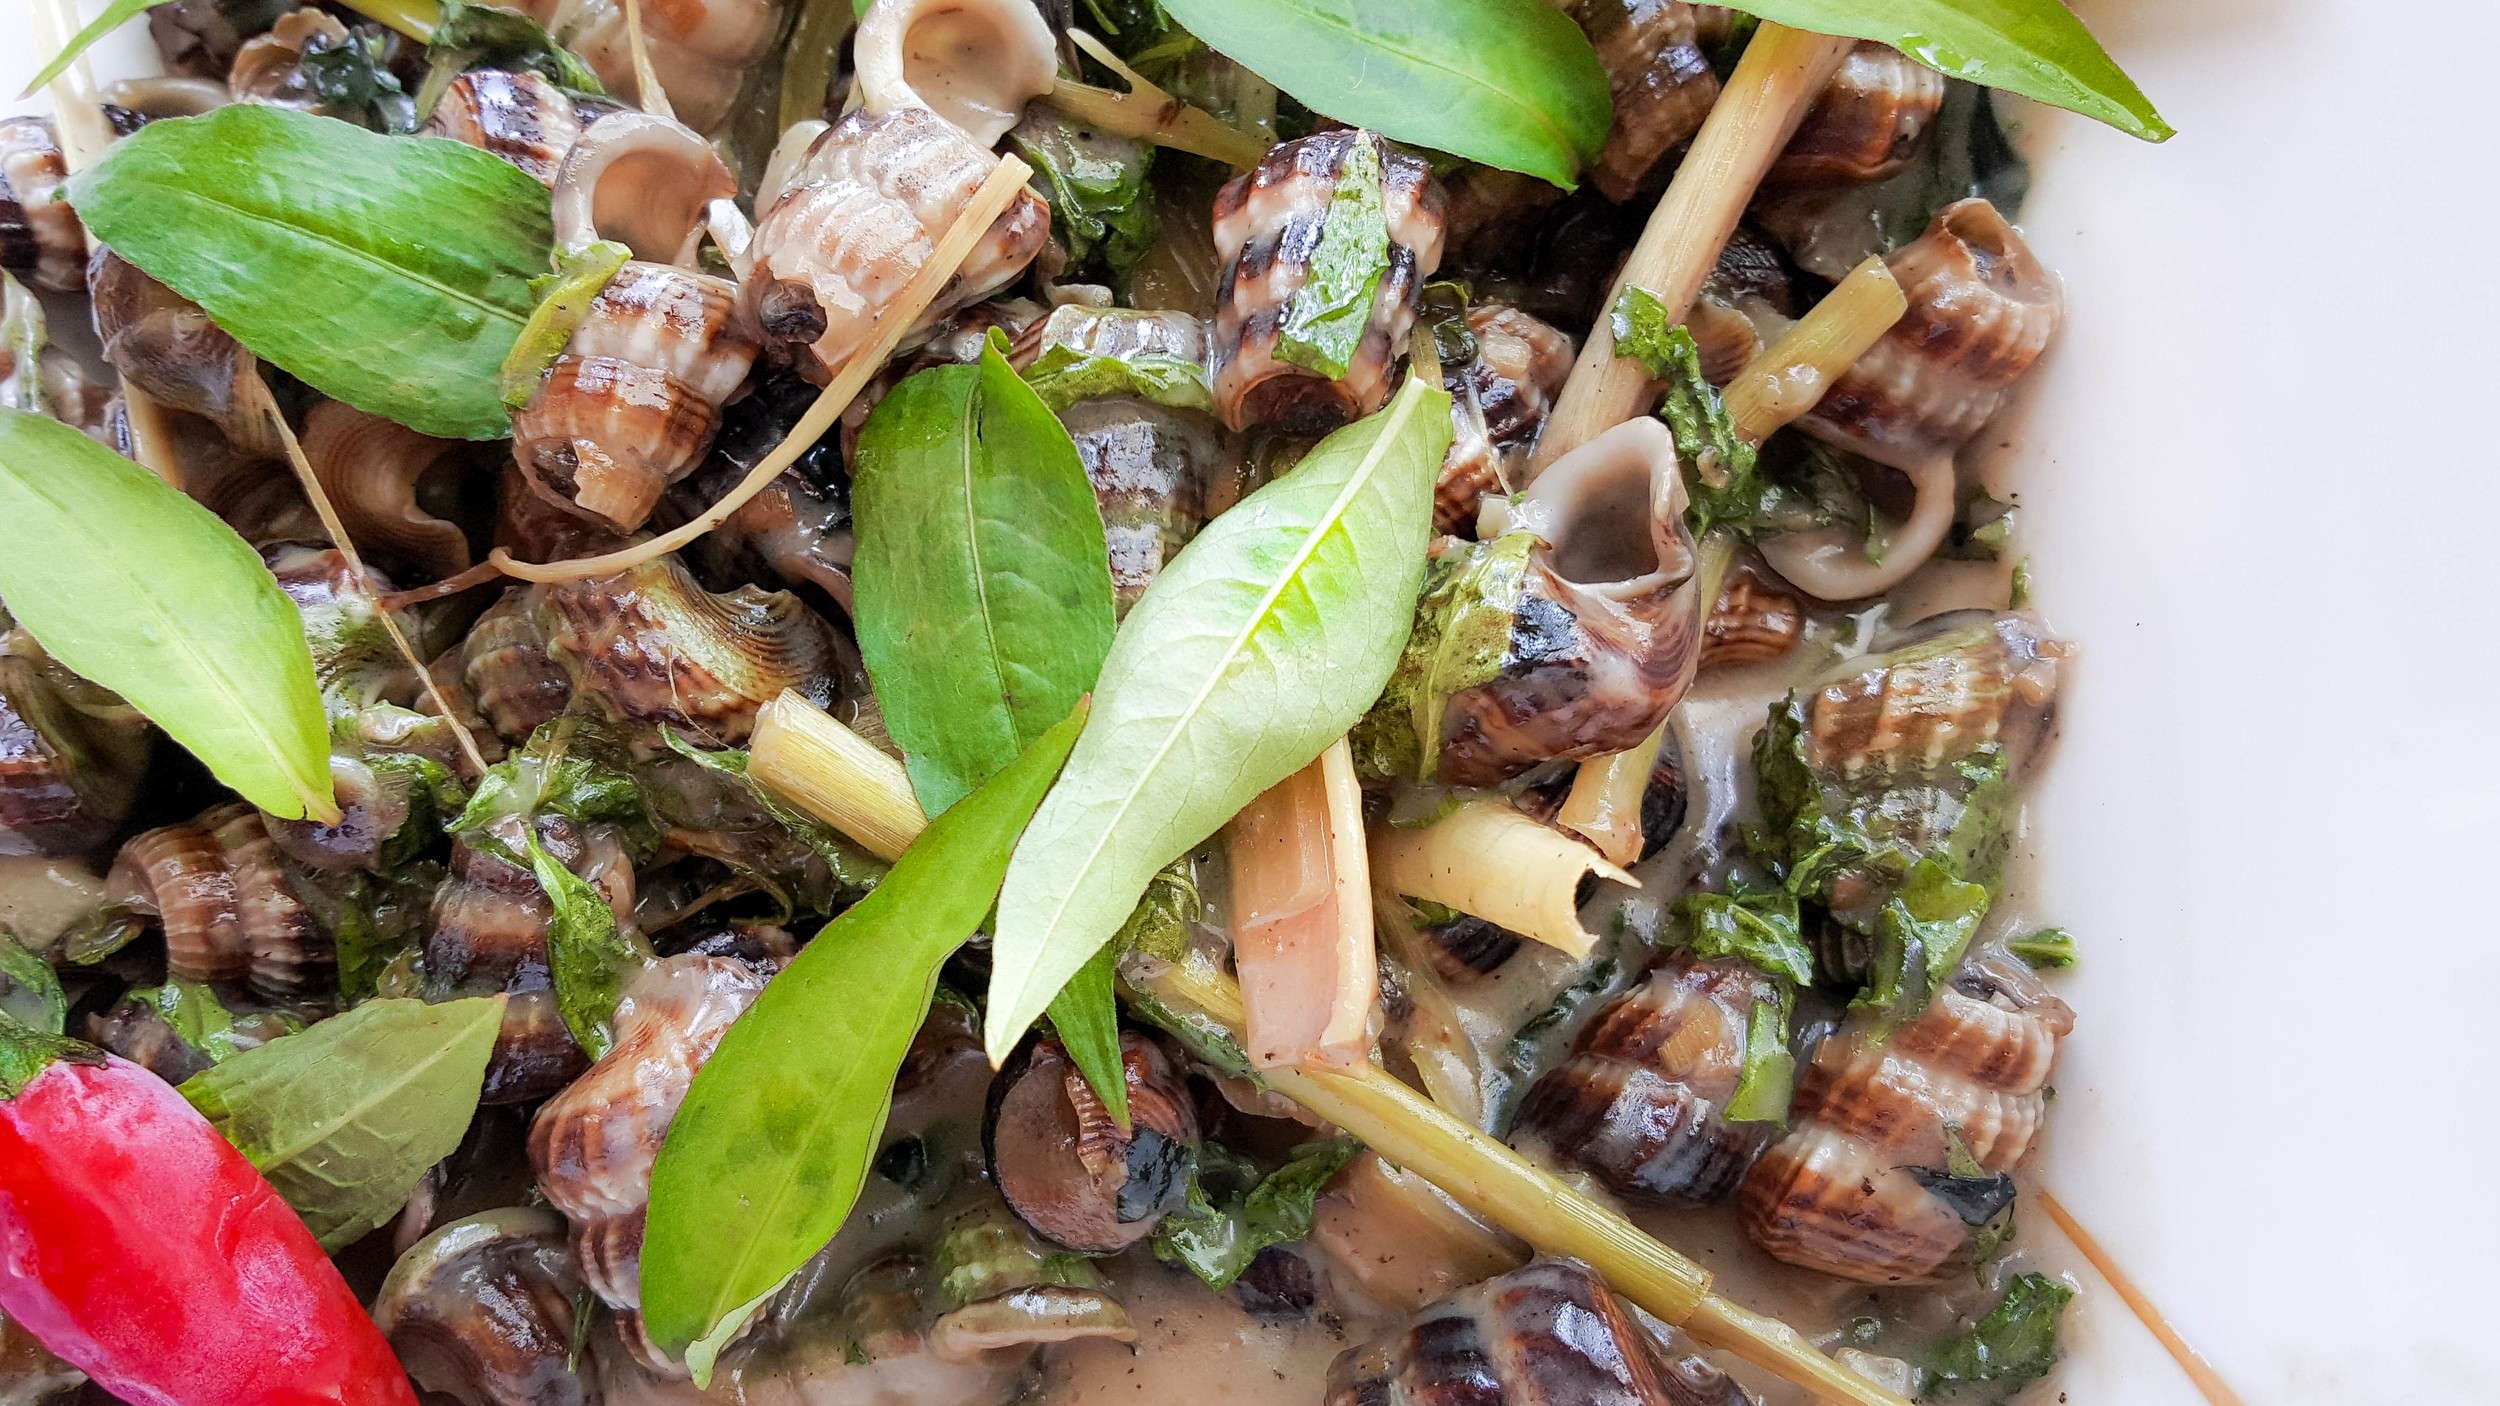 Sea Snails in Coconut Milk (Oc Len Xao Dua)